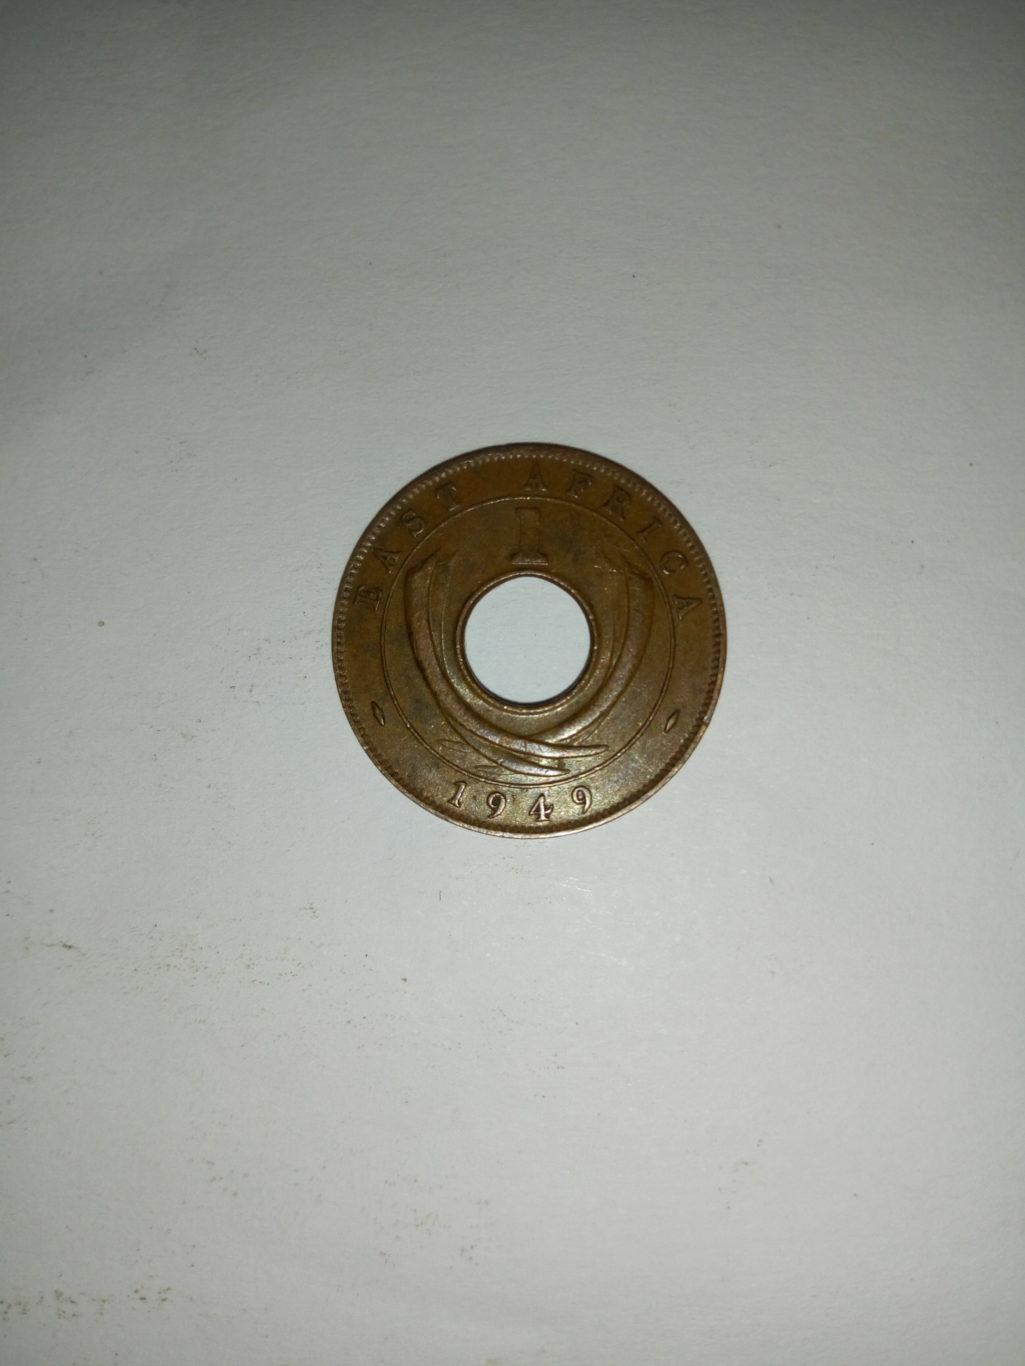 1940_georgivs east Africa 1 cent